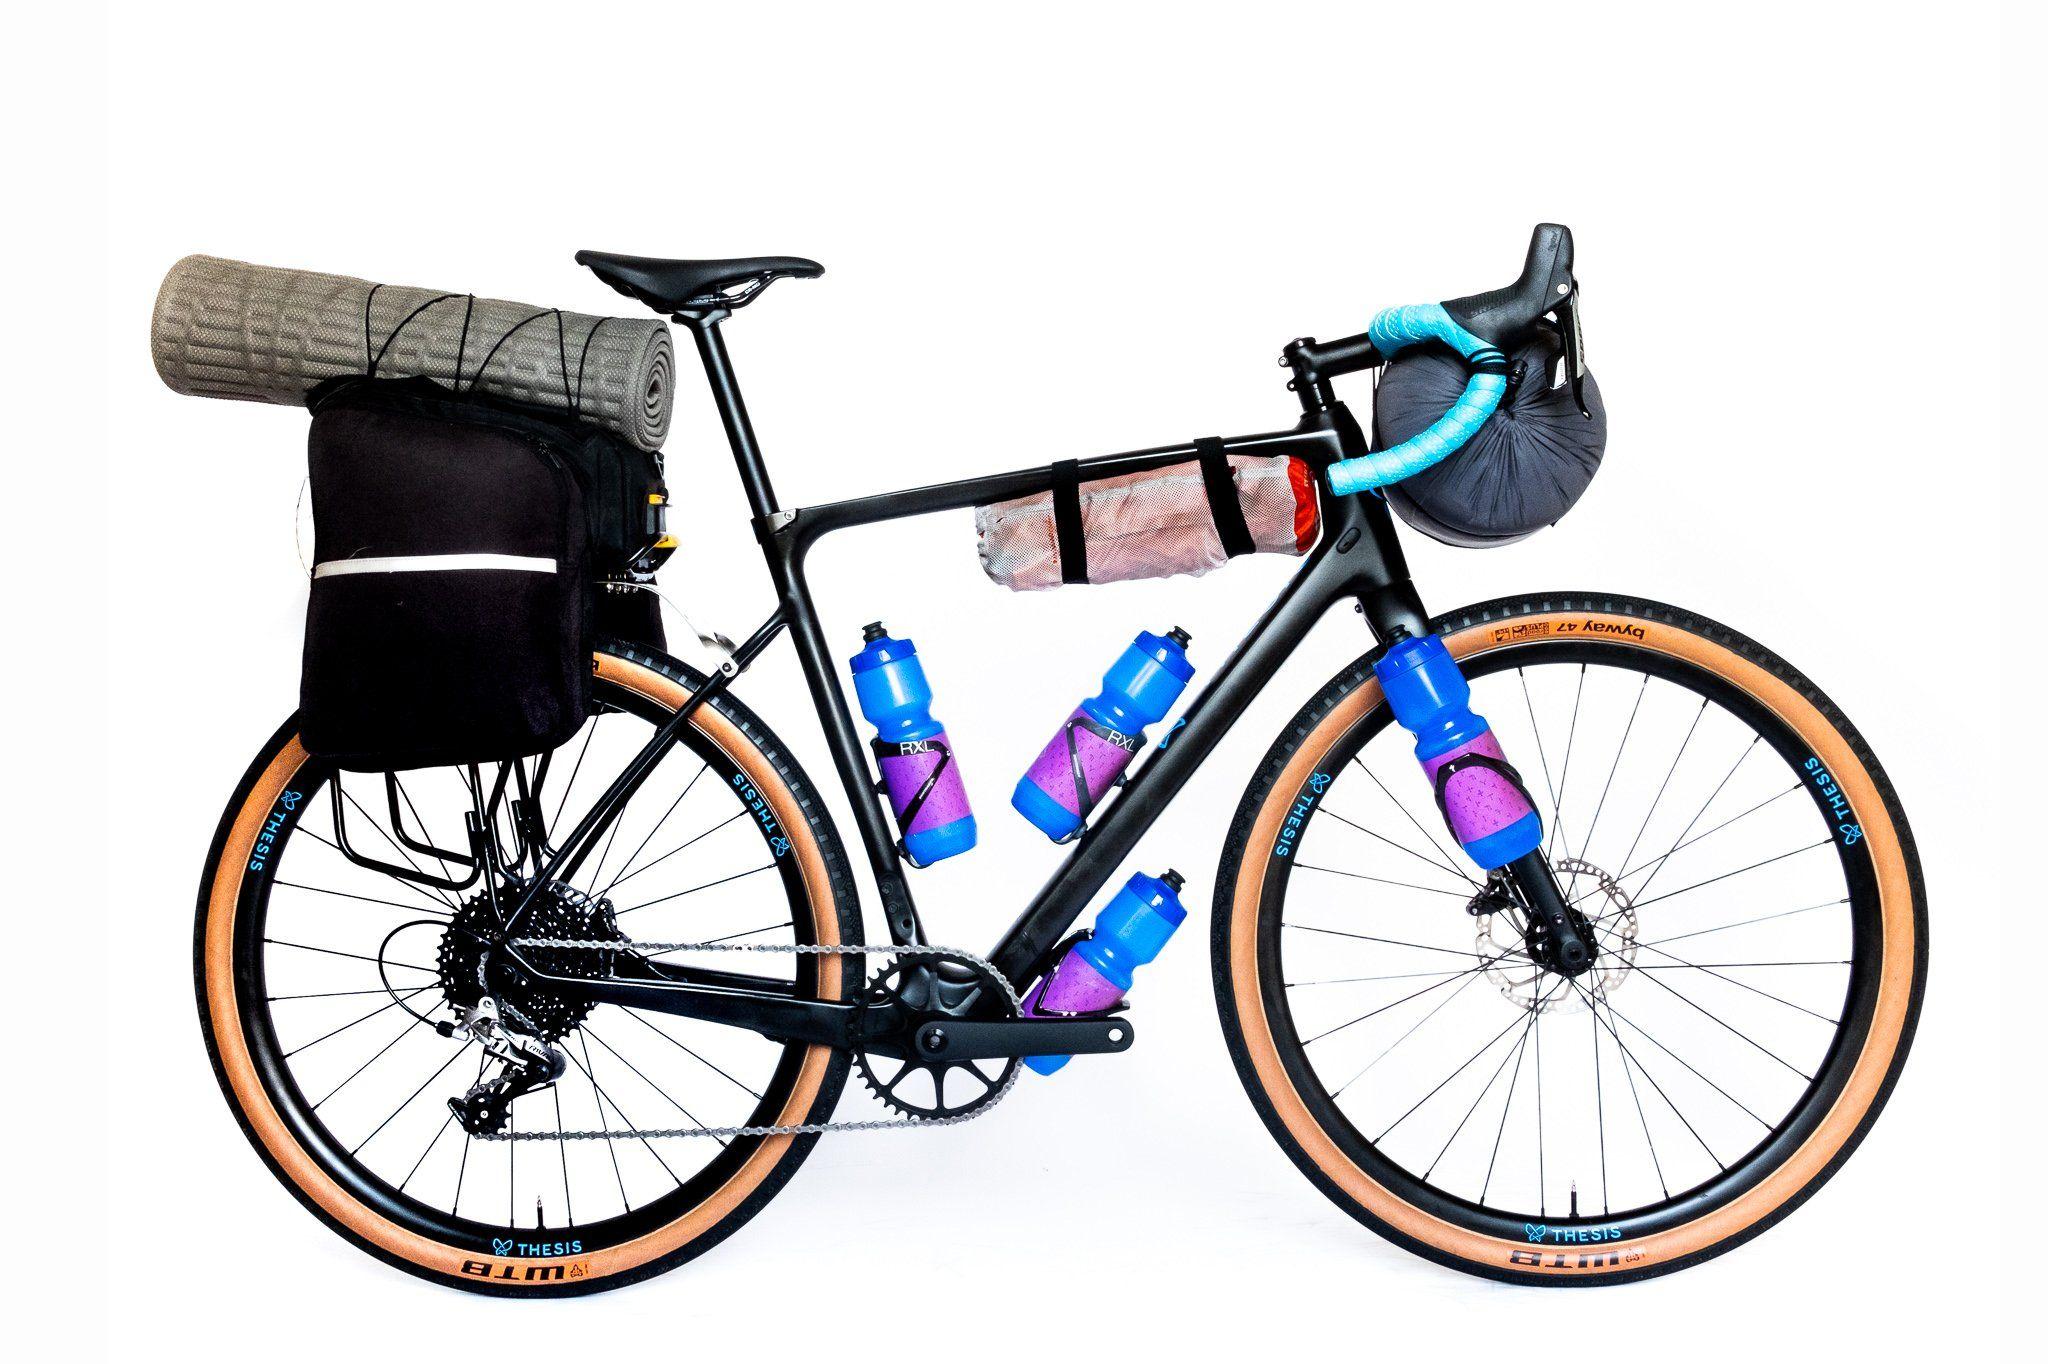 Upstart Brand Thesis Will Ship Ob1 Gravel Bike Straight To Your